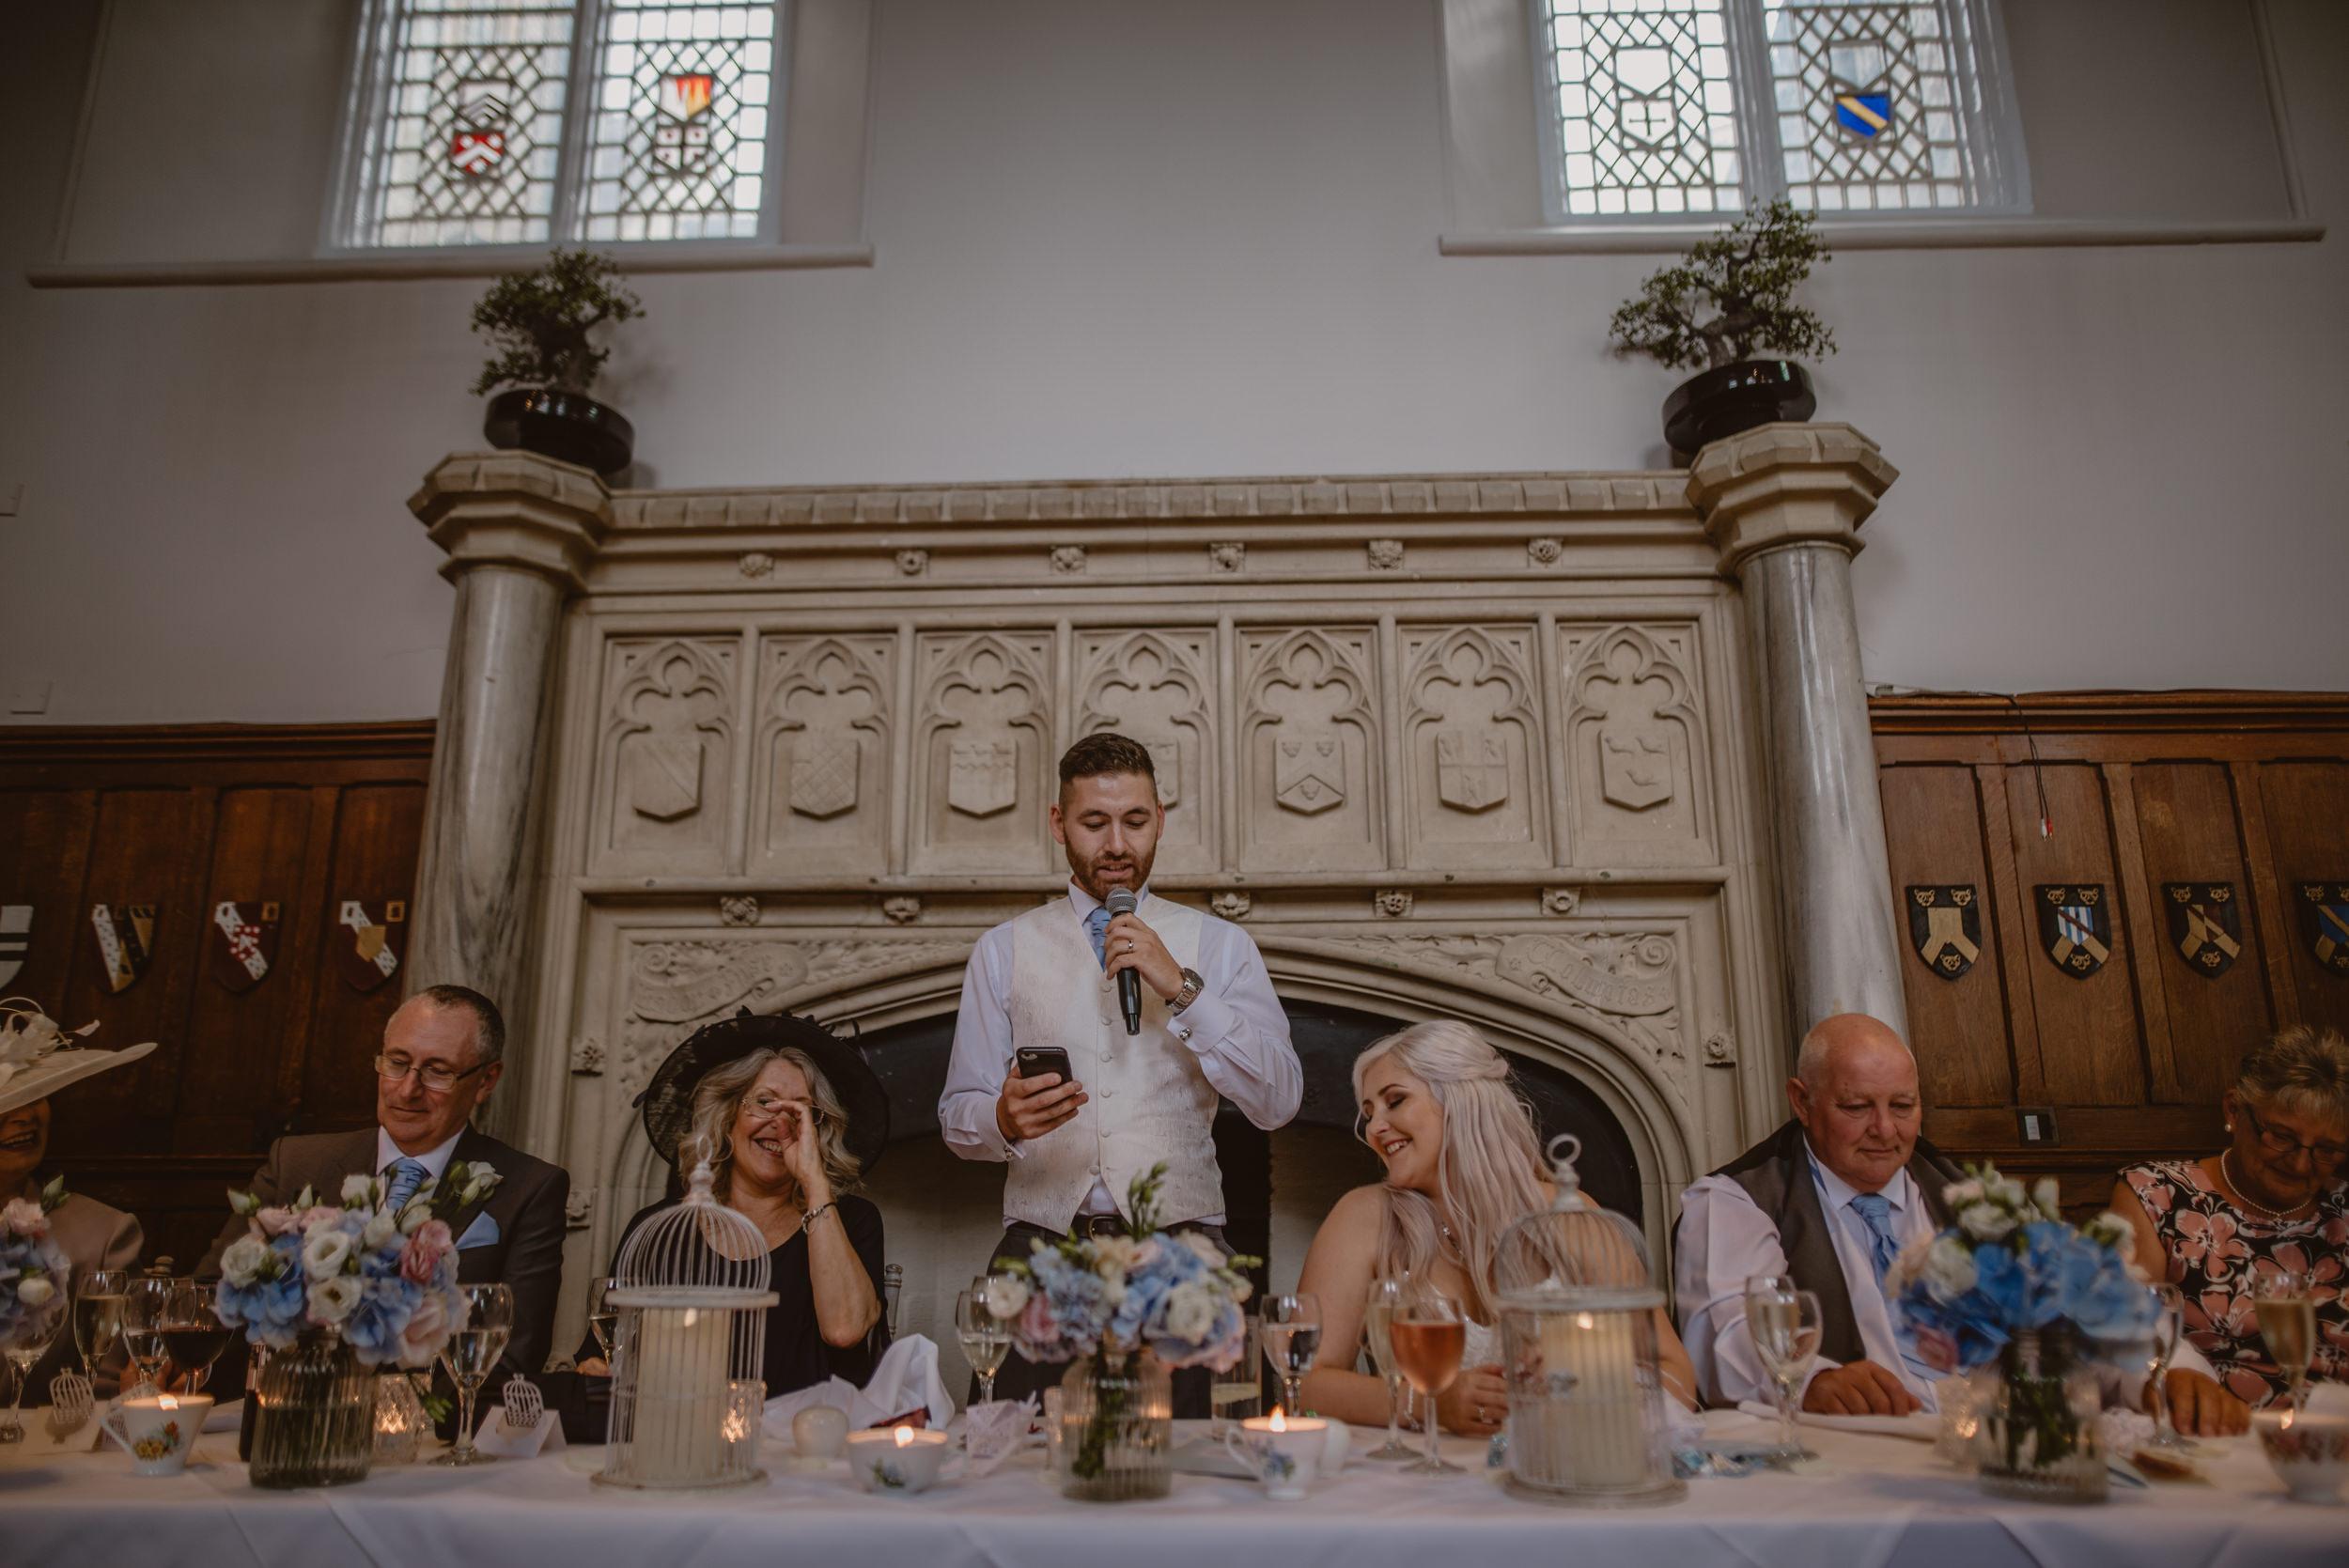 Rachel-and-James-Wedding-Horsley-Towers-State-Manu-Mendoza-Wedding-Photography-400.jpg